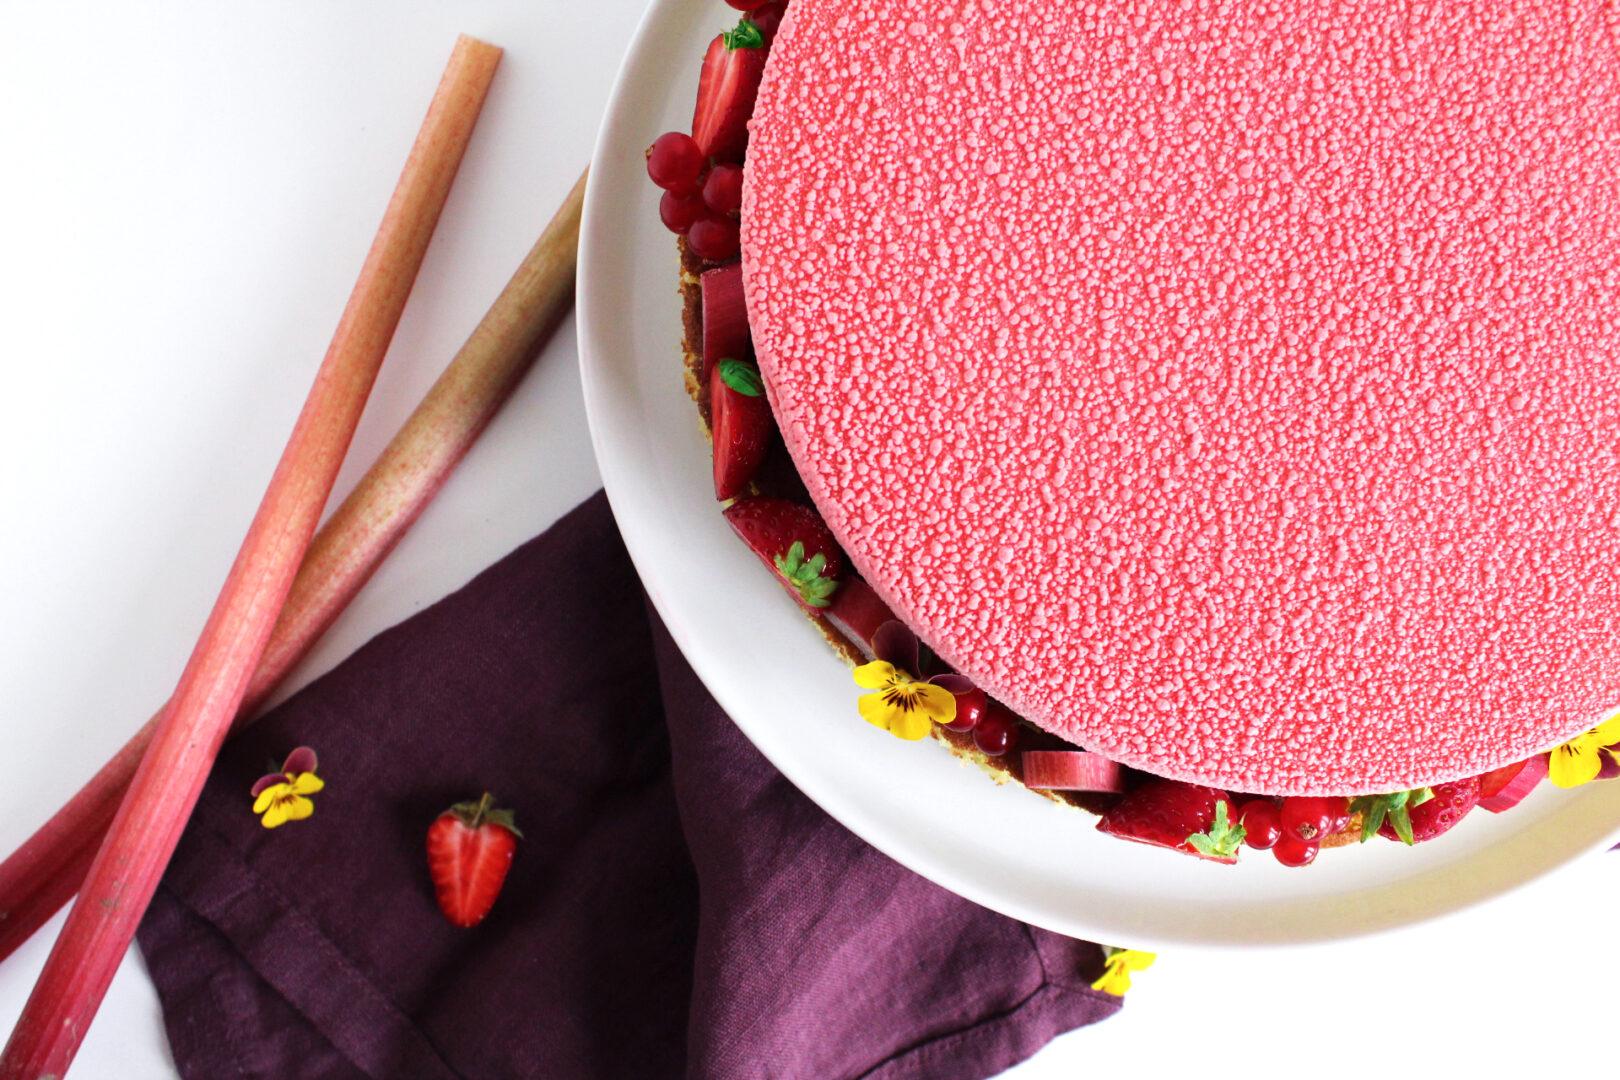 Hjemmelavet jordbær-rabarber kage med Råstoff Strawberry-Rhubarb